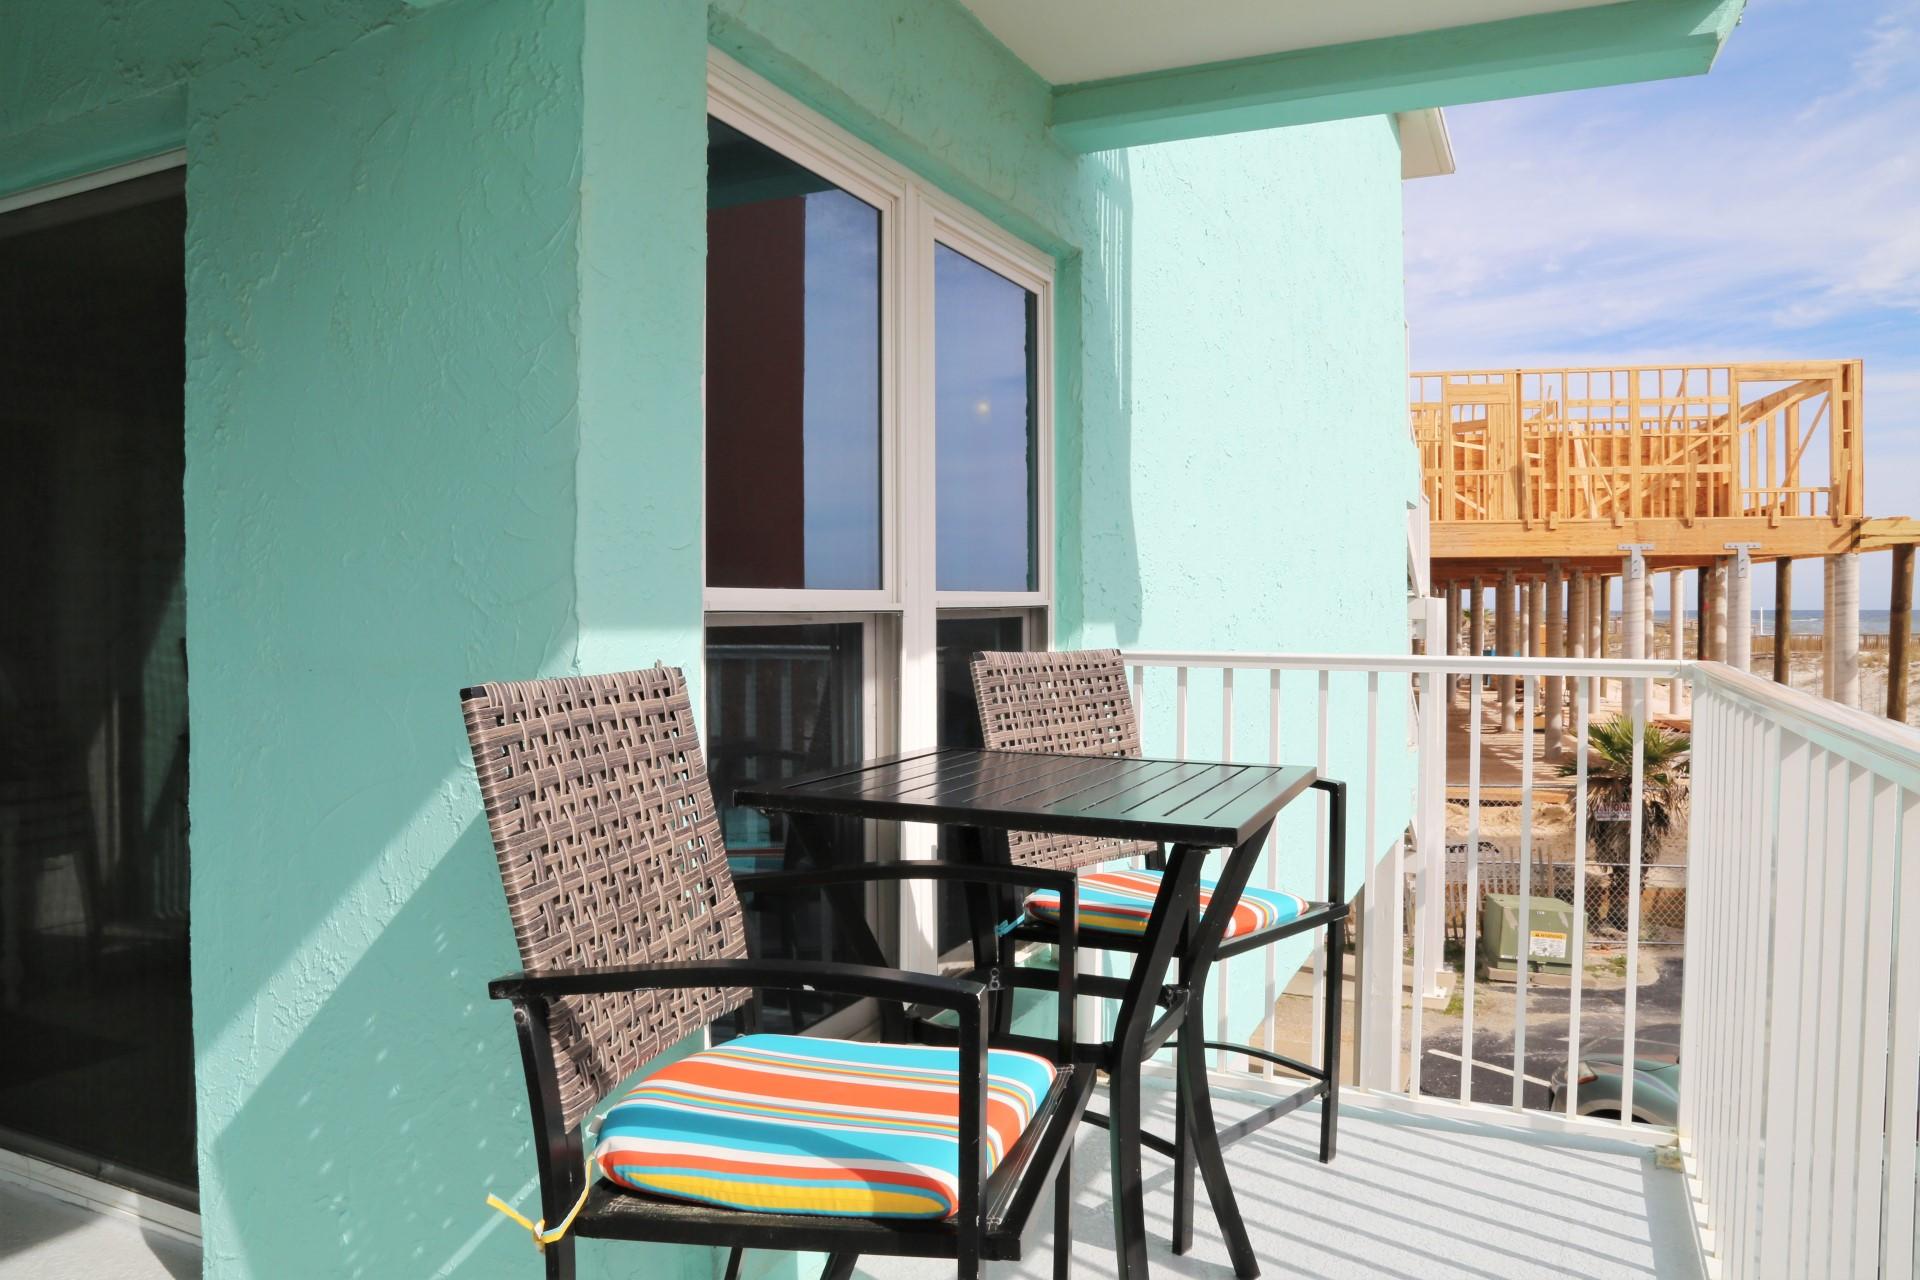 Harbor Huse B17 - balcony seating